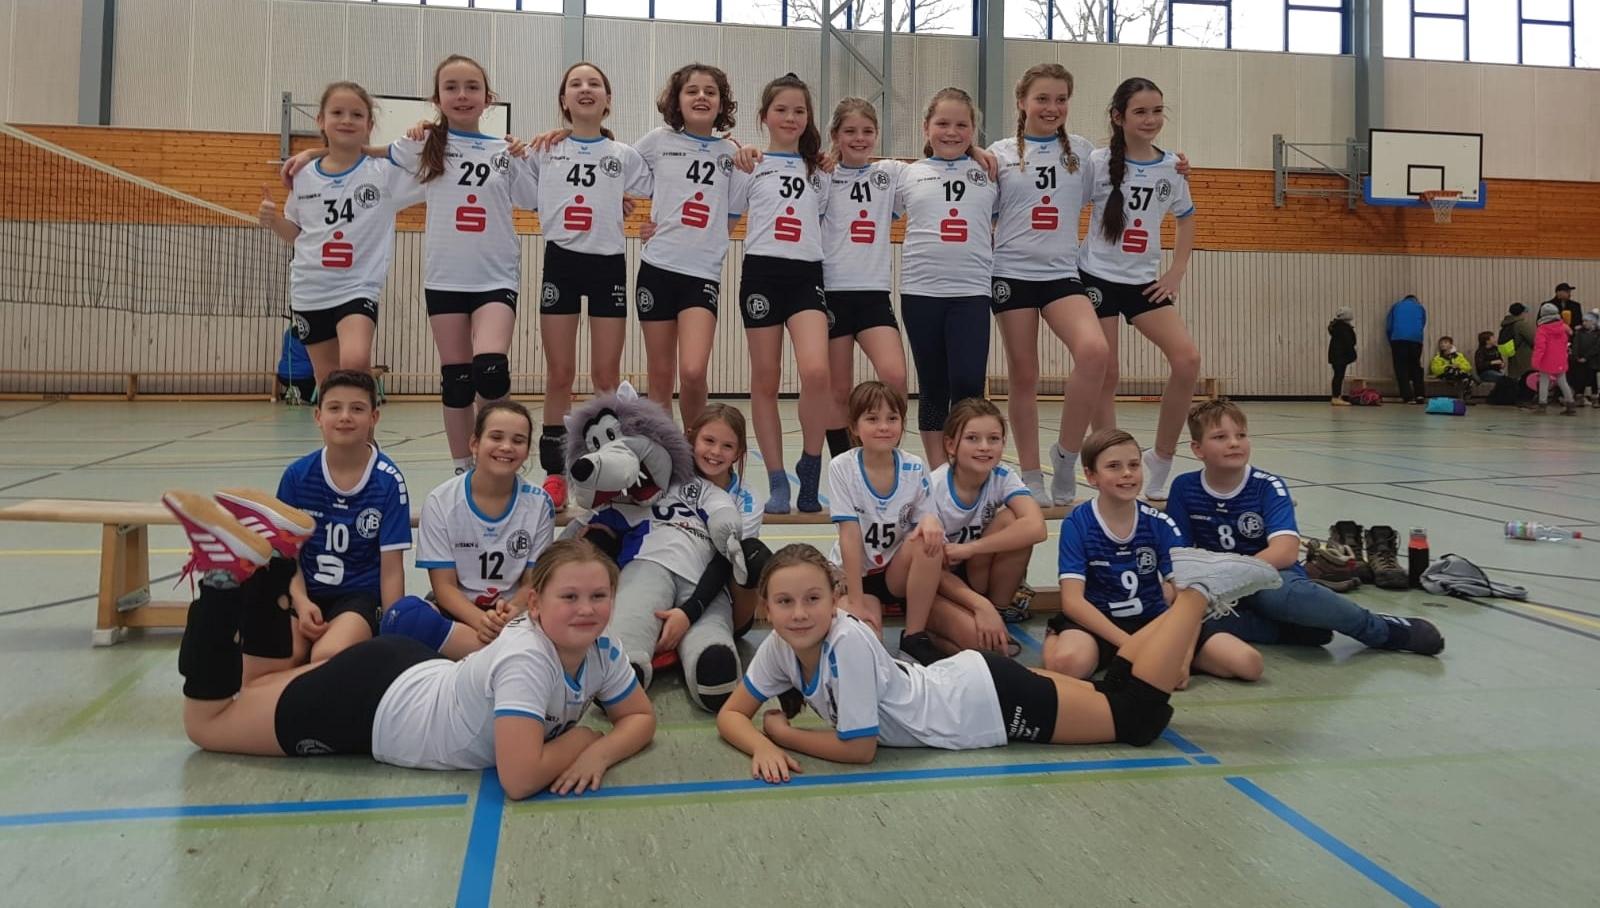 VfB 91 Suhl U12 . 19.01.2020 Sporthalle